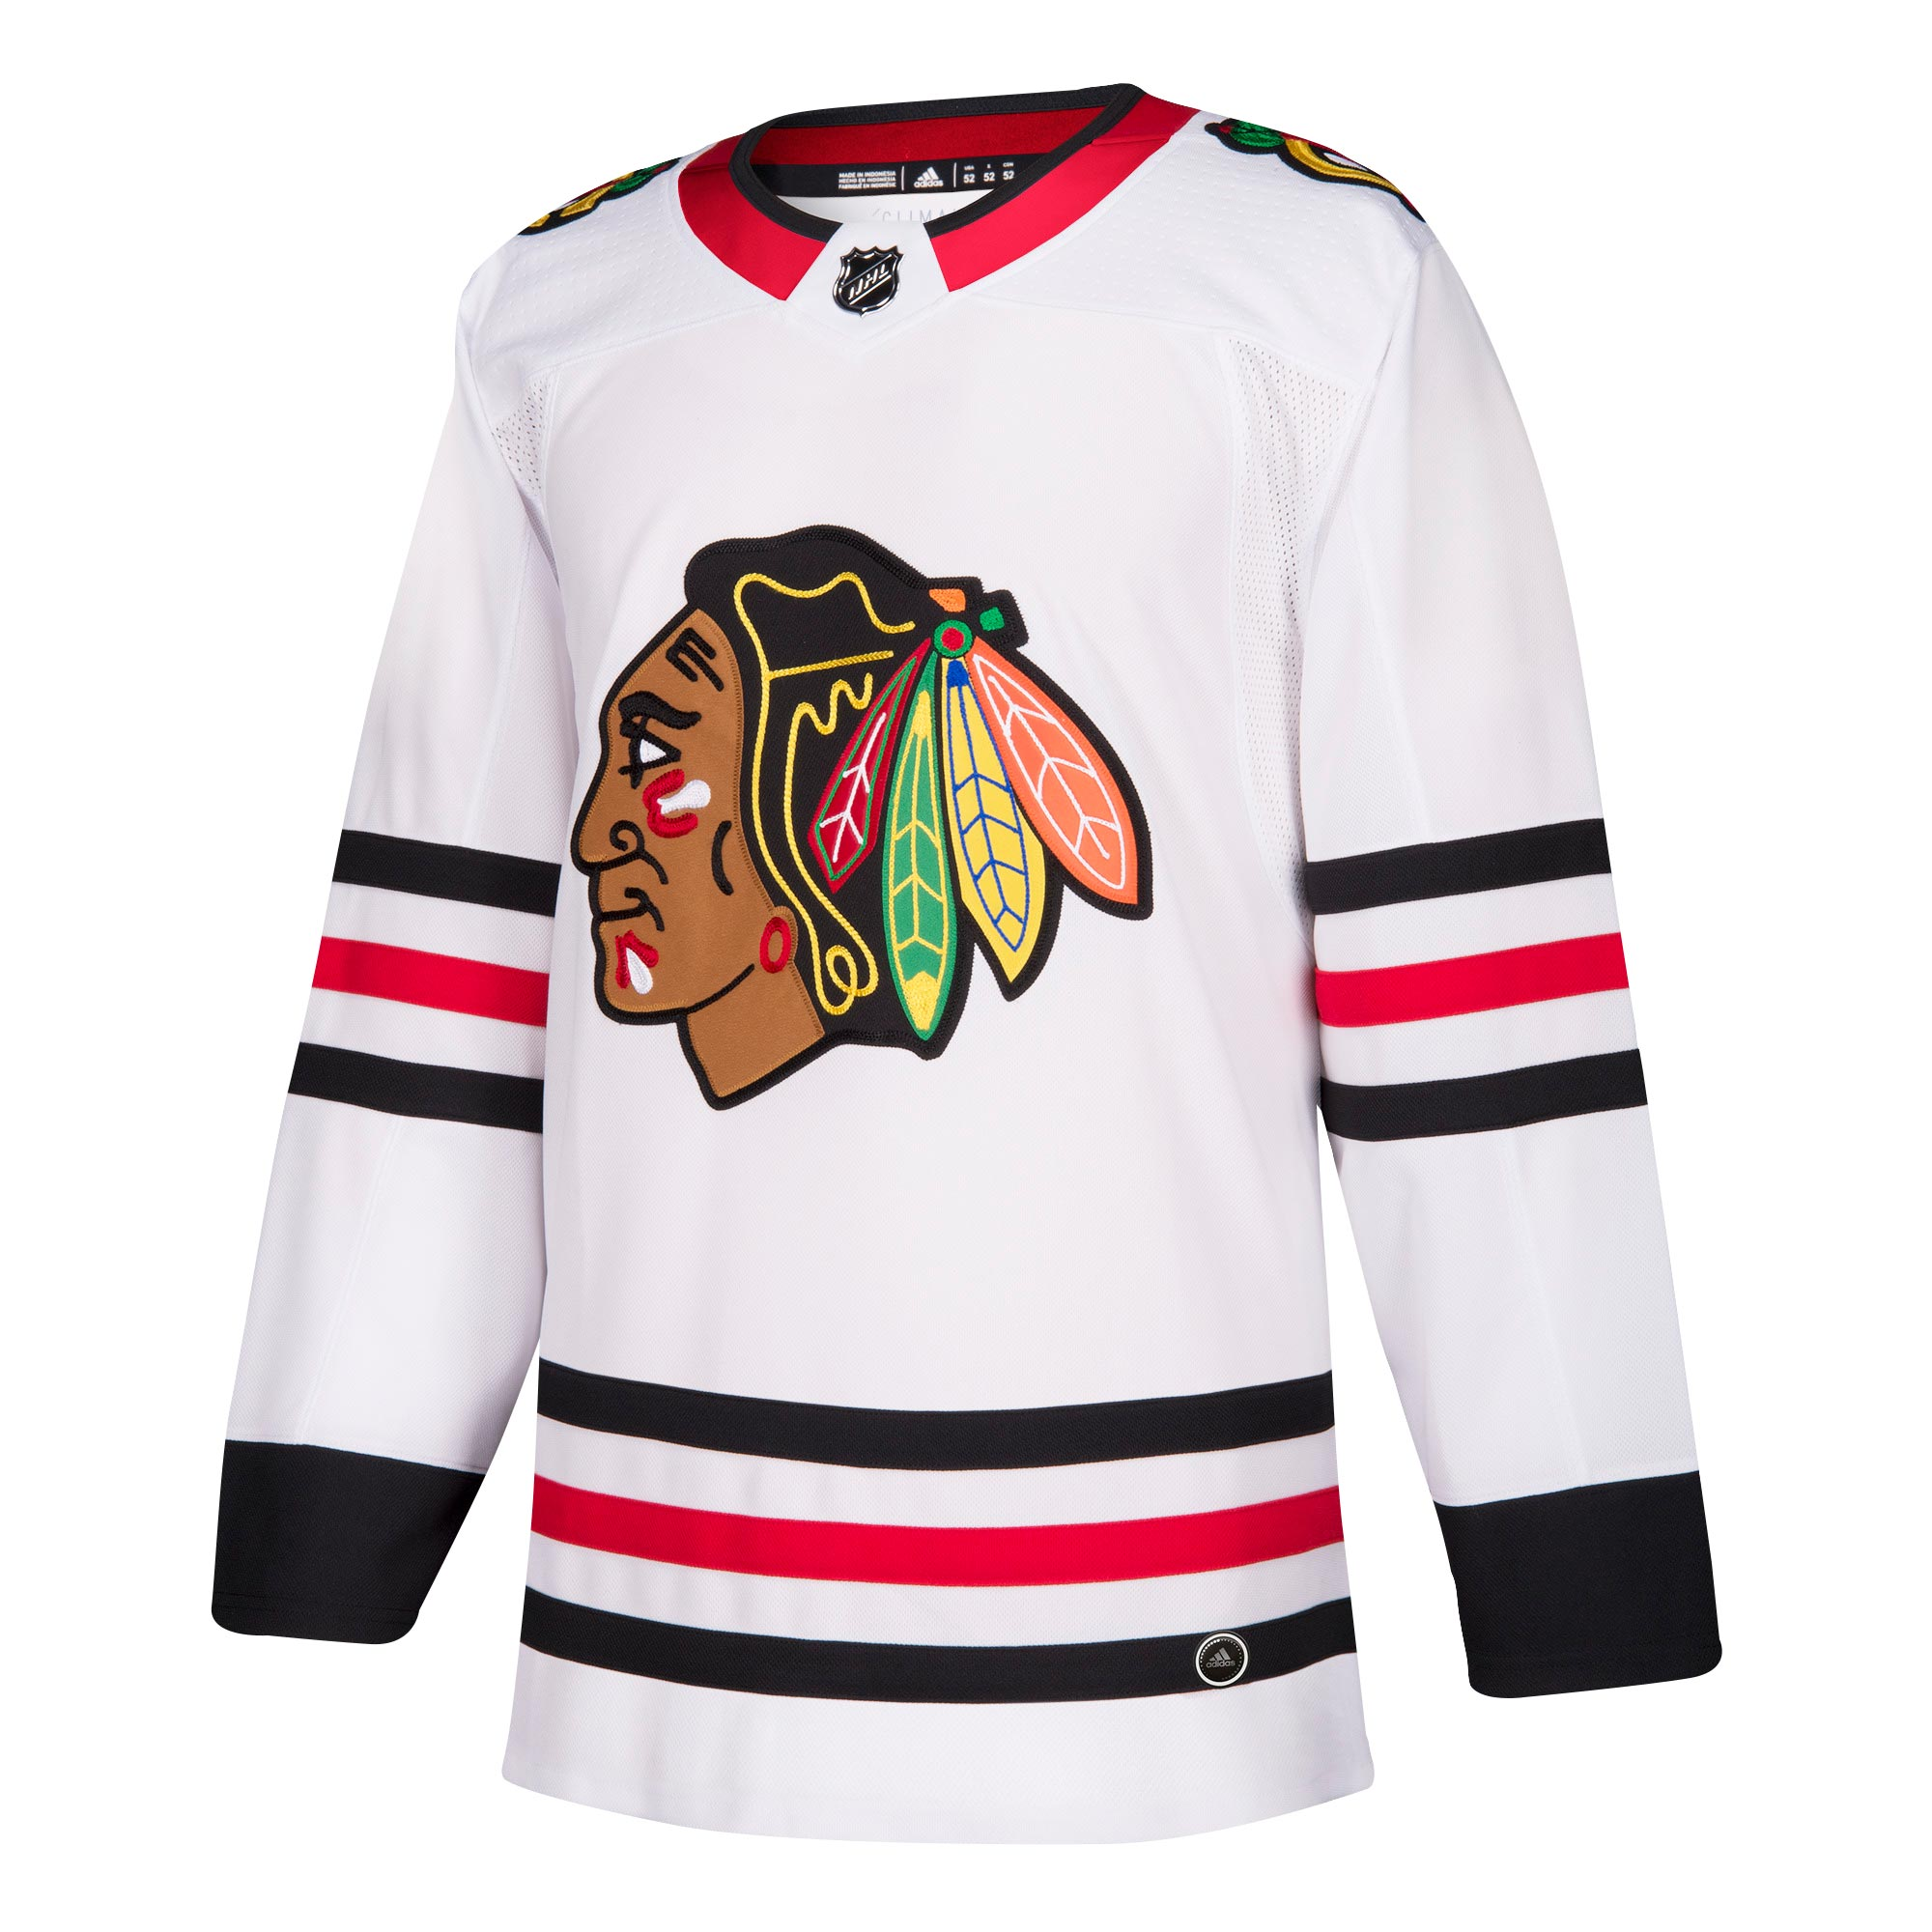 bb62a12ad5b7c Hokejové kluby (všetky) | Adidas Chicago Blackhawks adizero ...